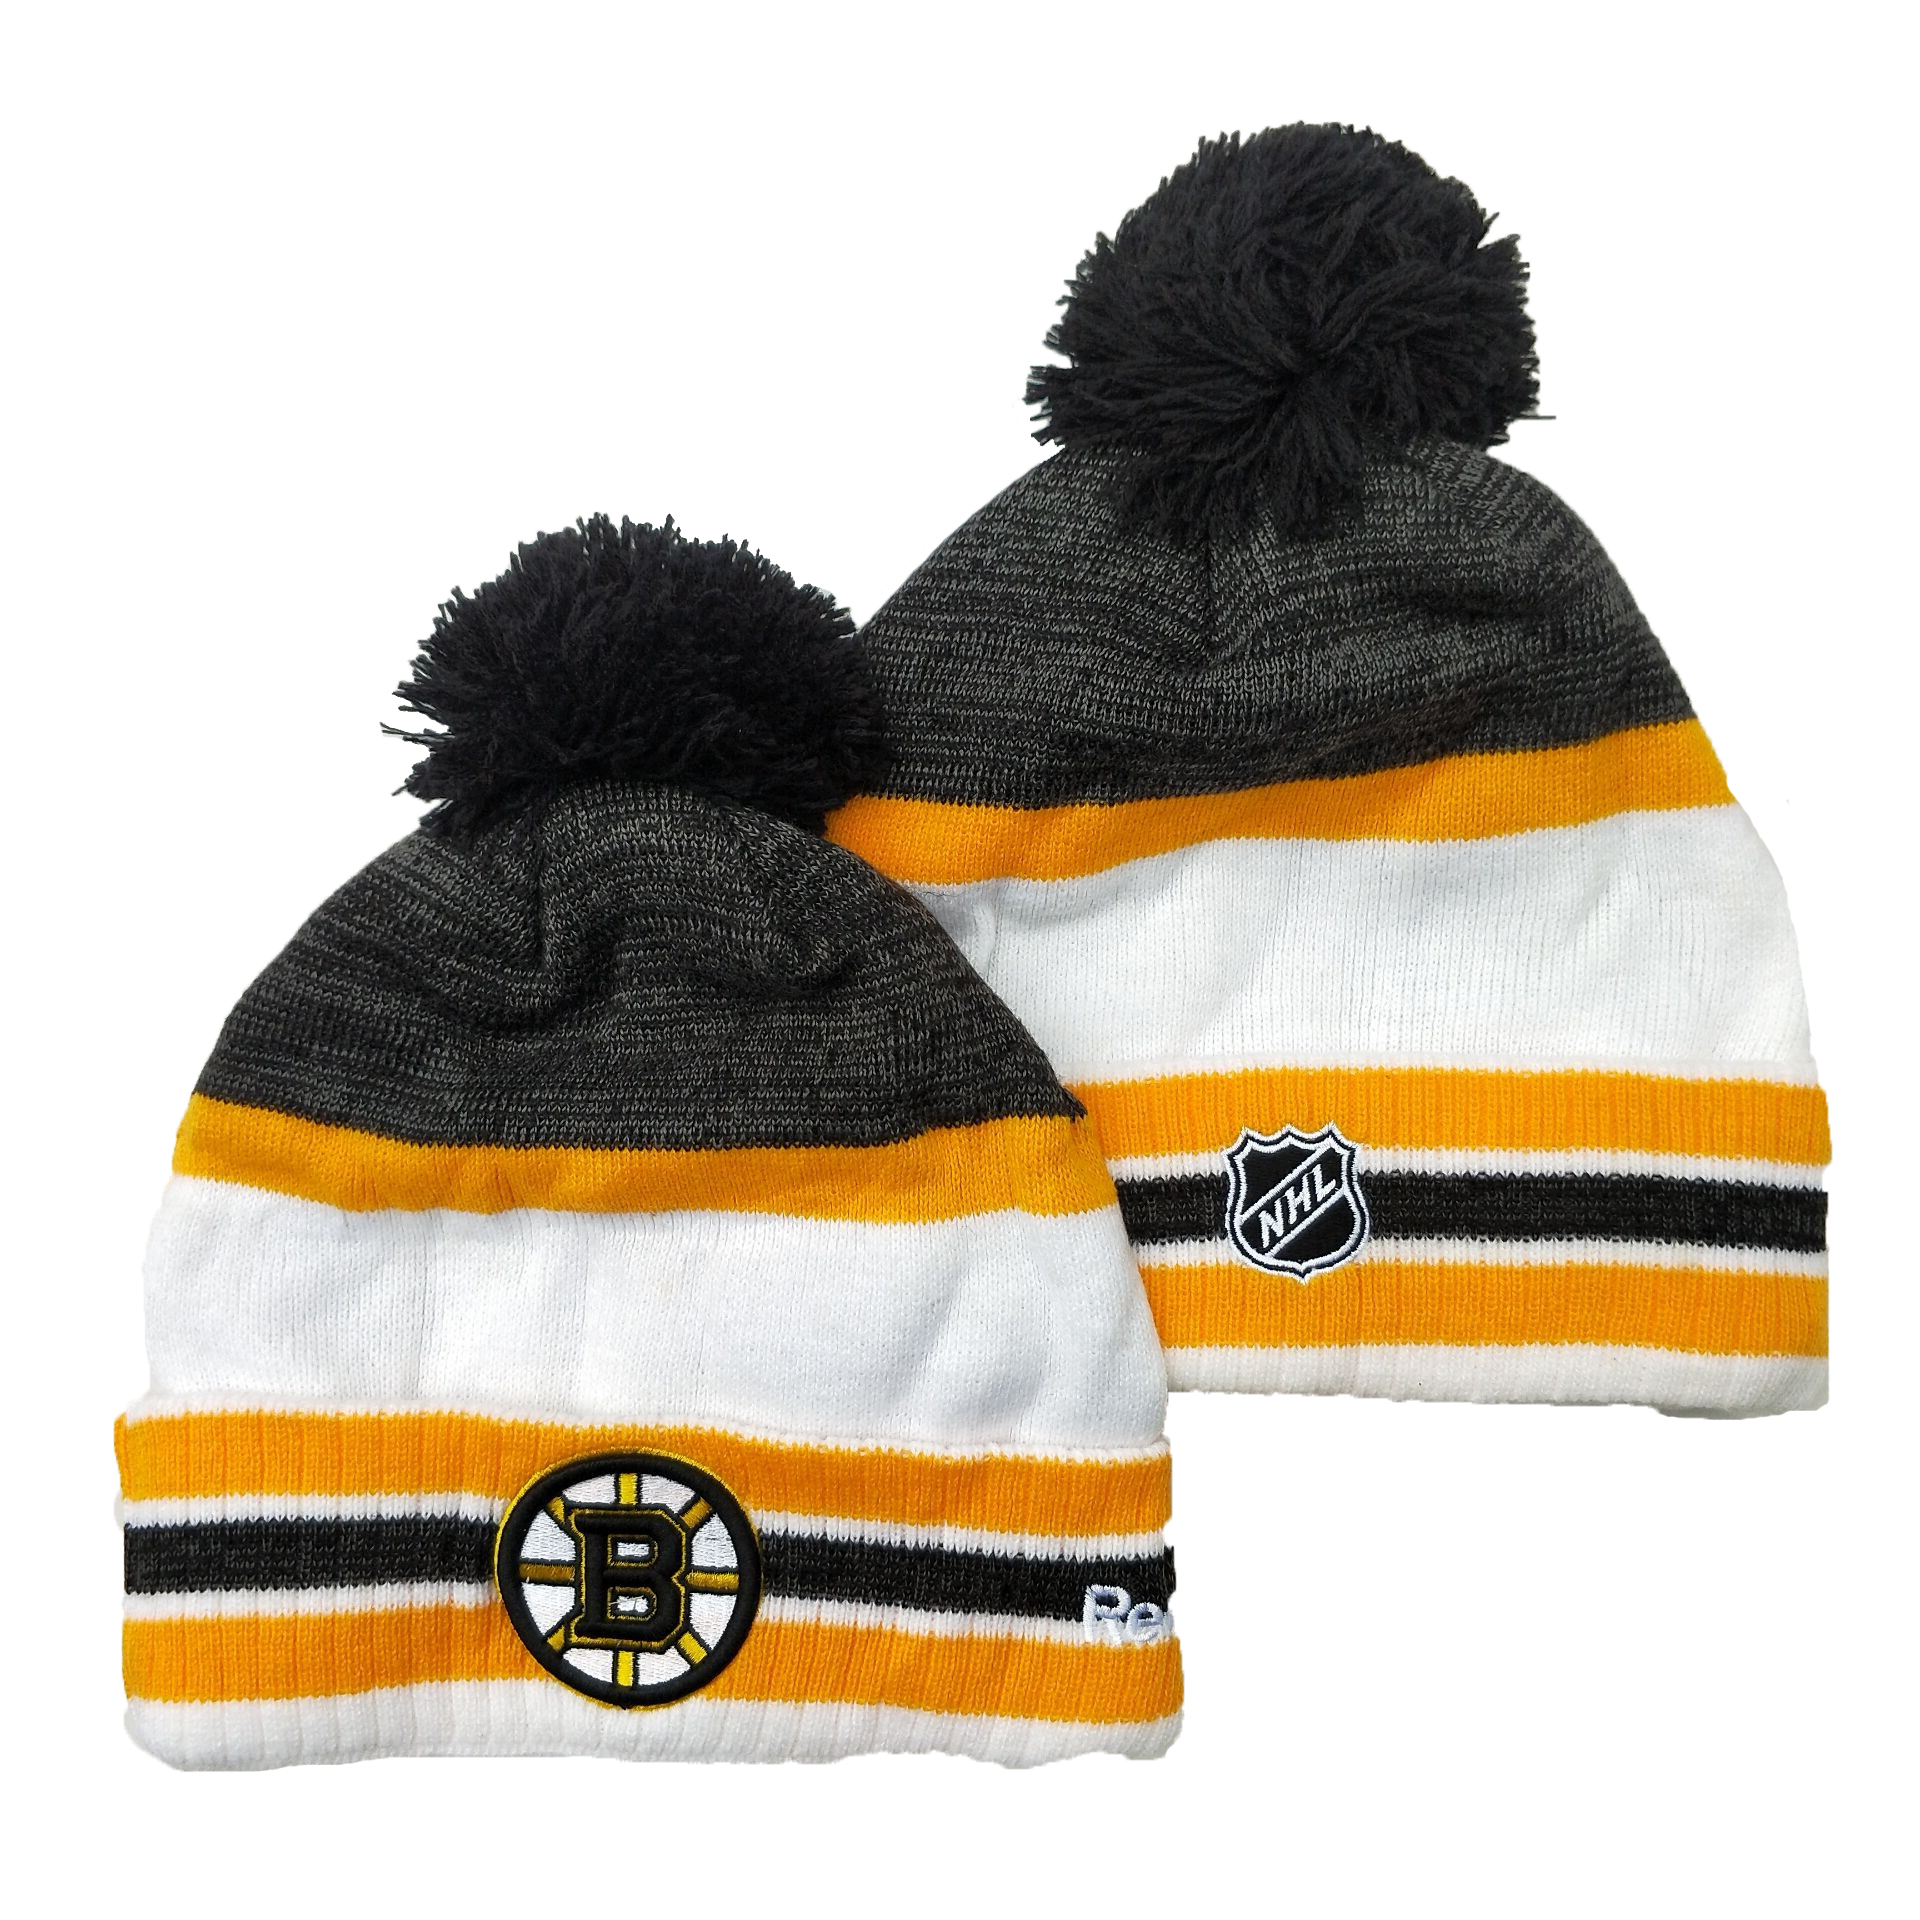 Bruins Team Logo Gray Yellow White Pom Cuffed Knit Hat YD